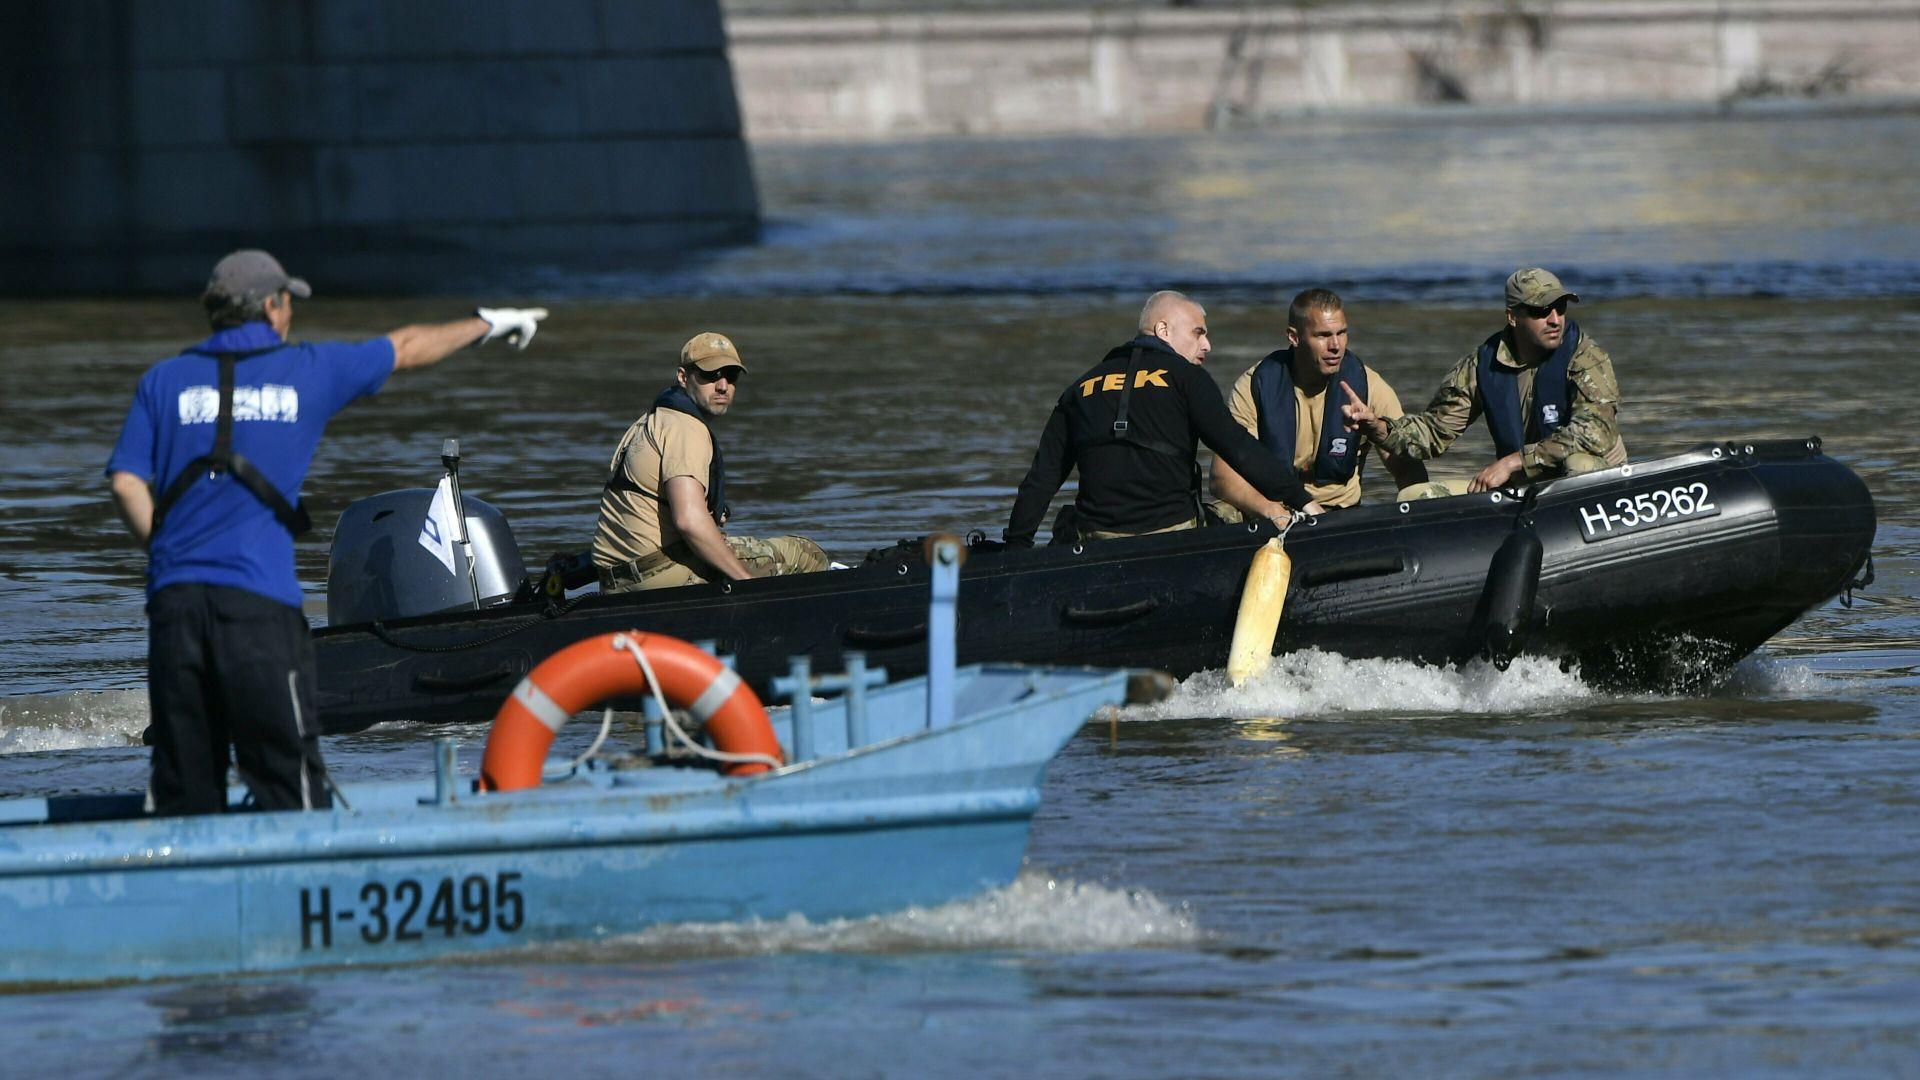 Корейски гмуркачи проучват потъналото корабче на Дунав (снимки)